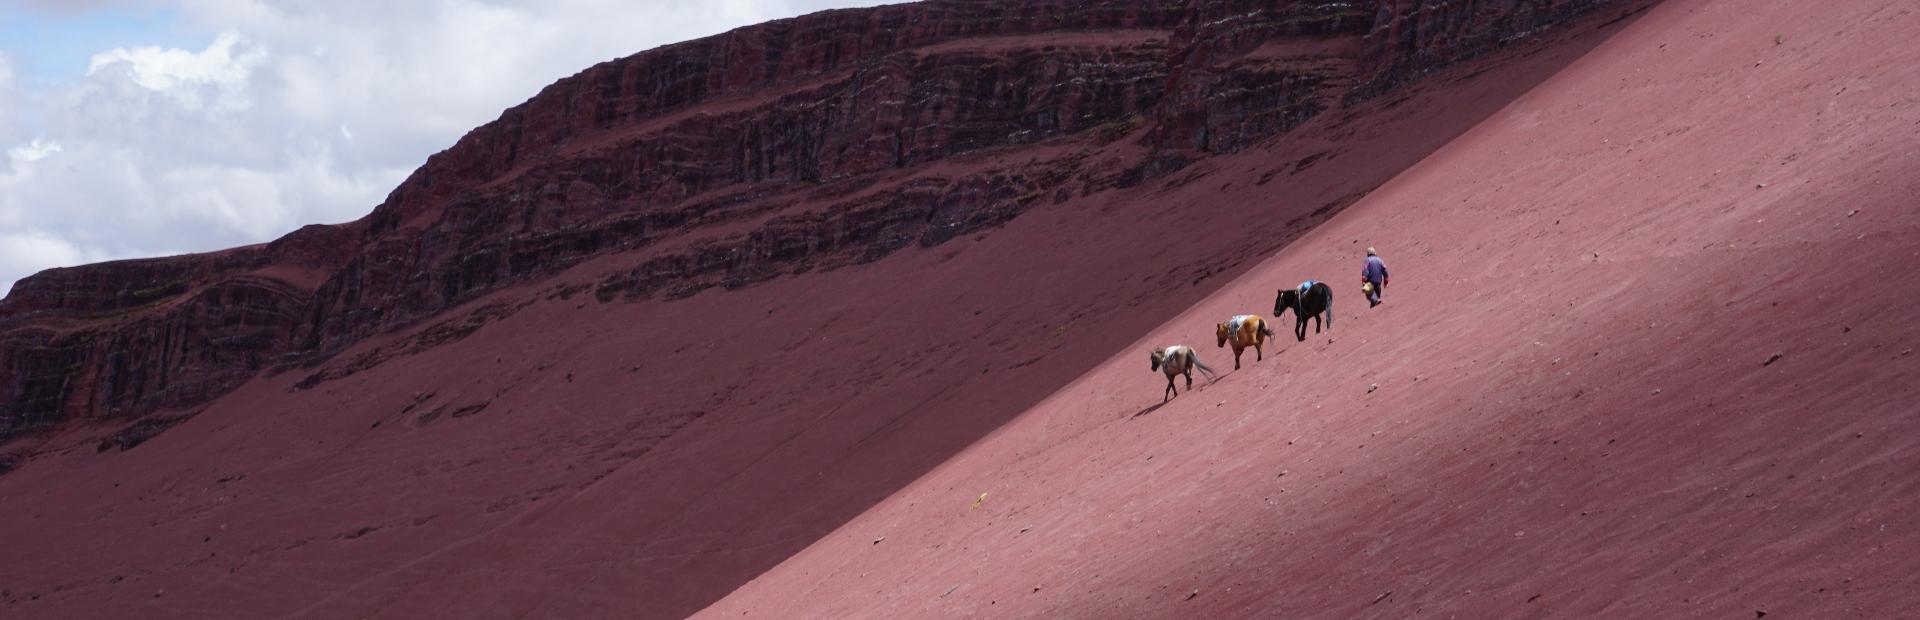 Peru-Rainbow-Mountain- Red Valley